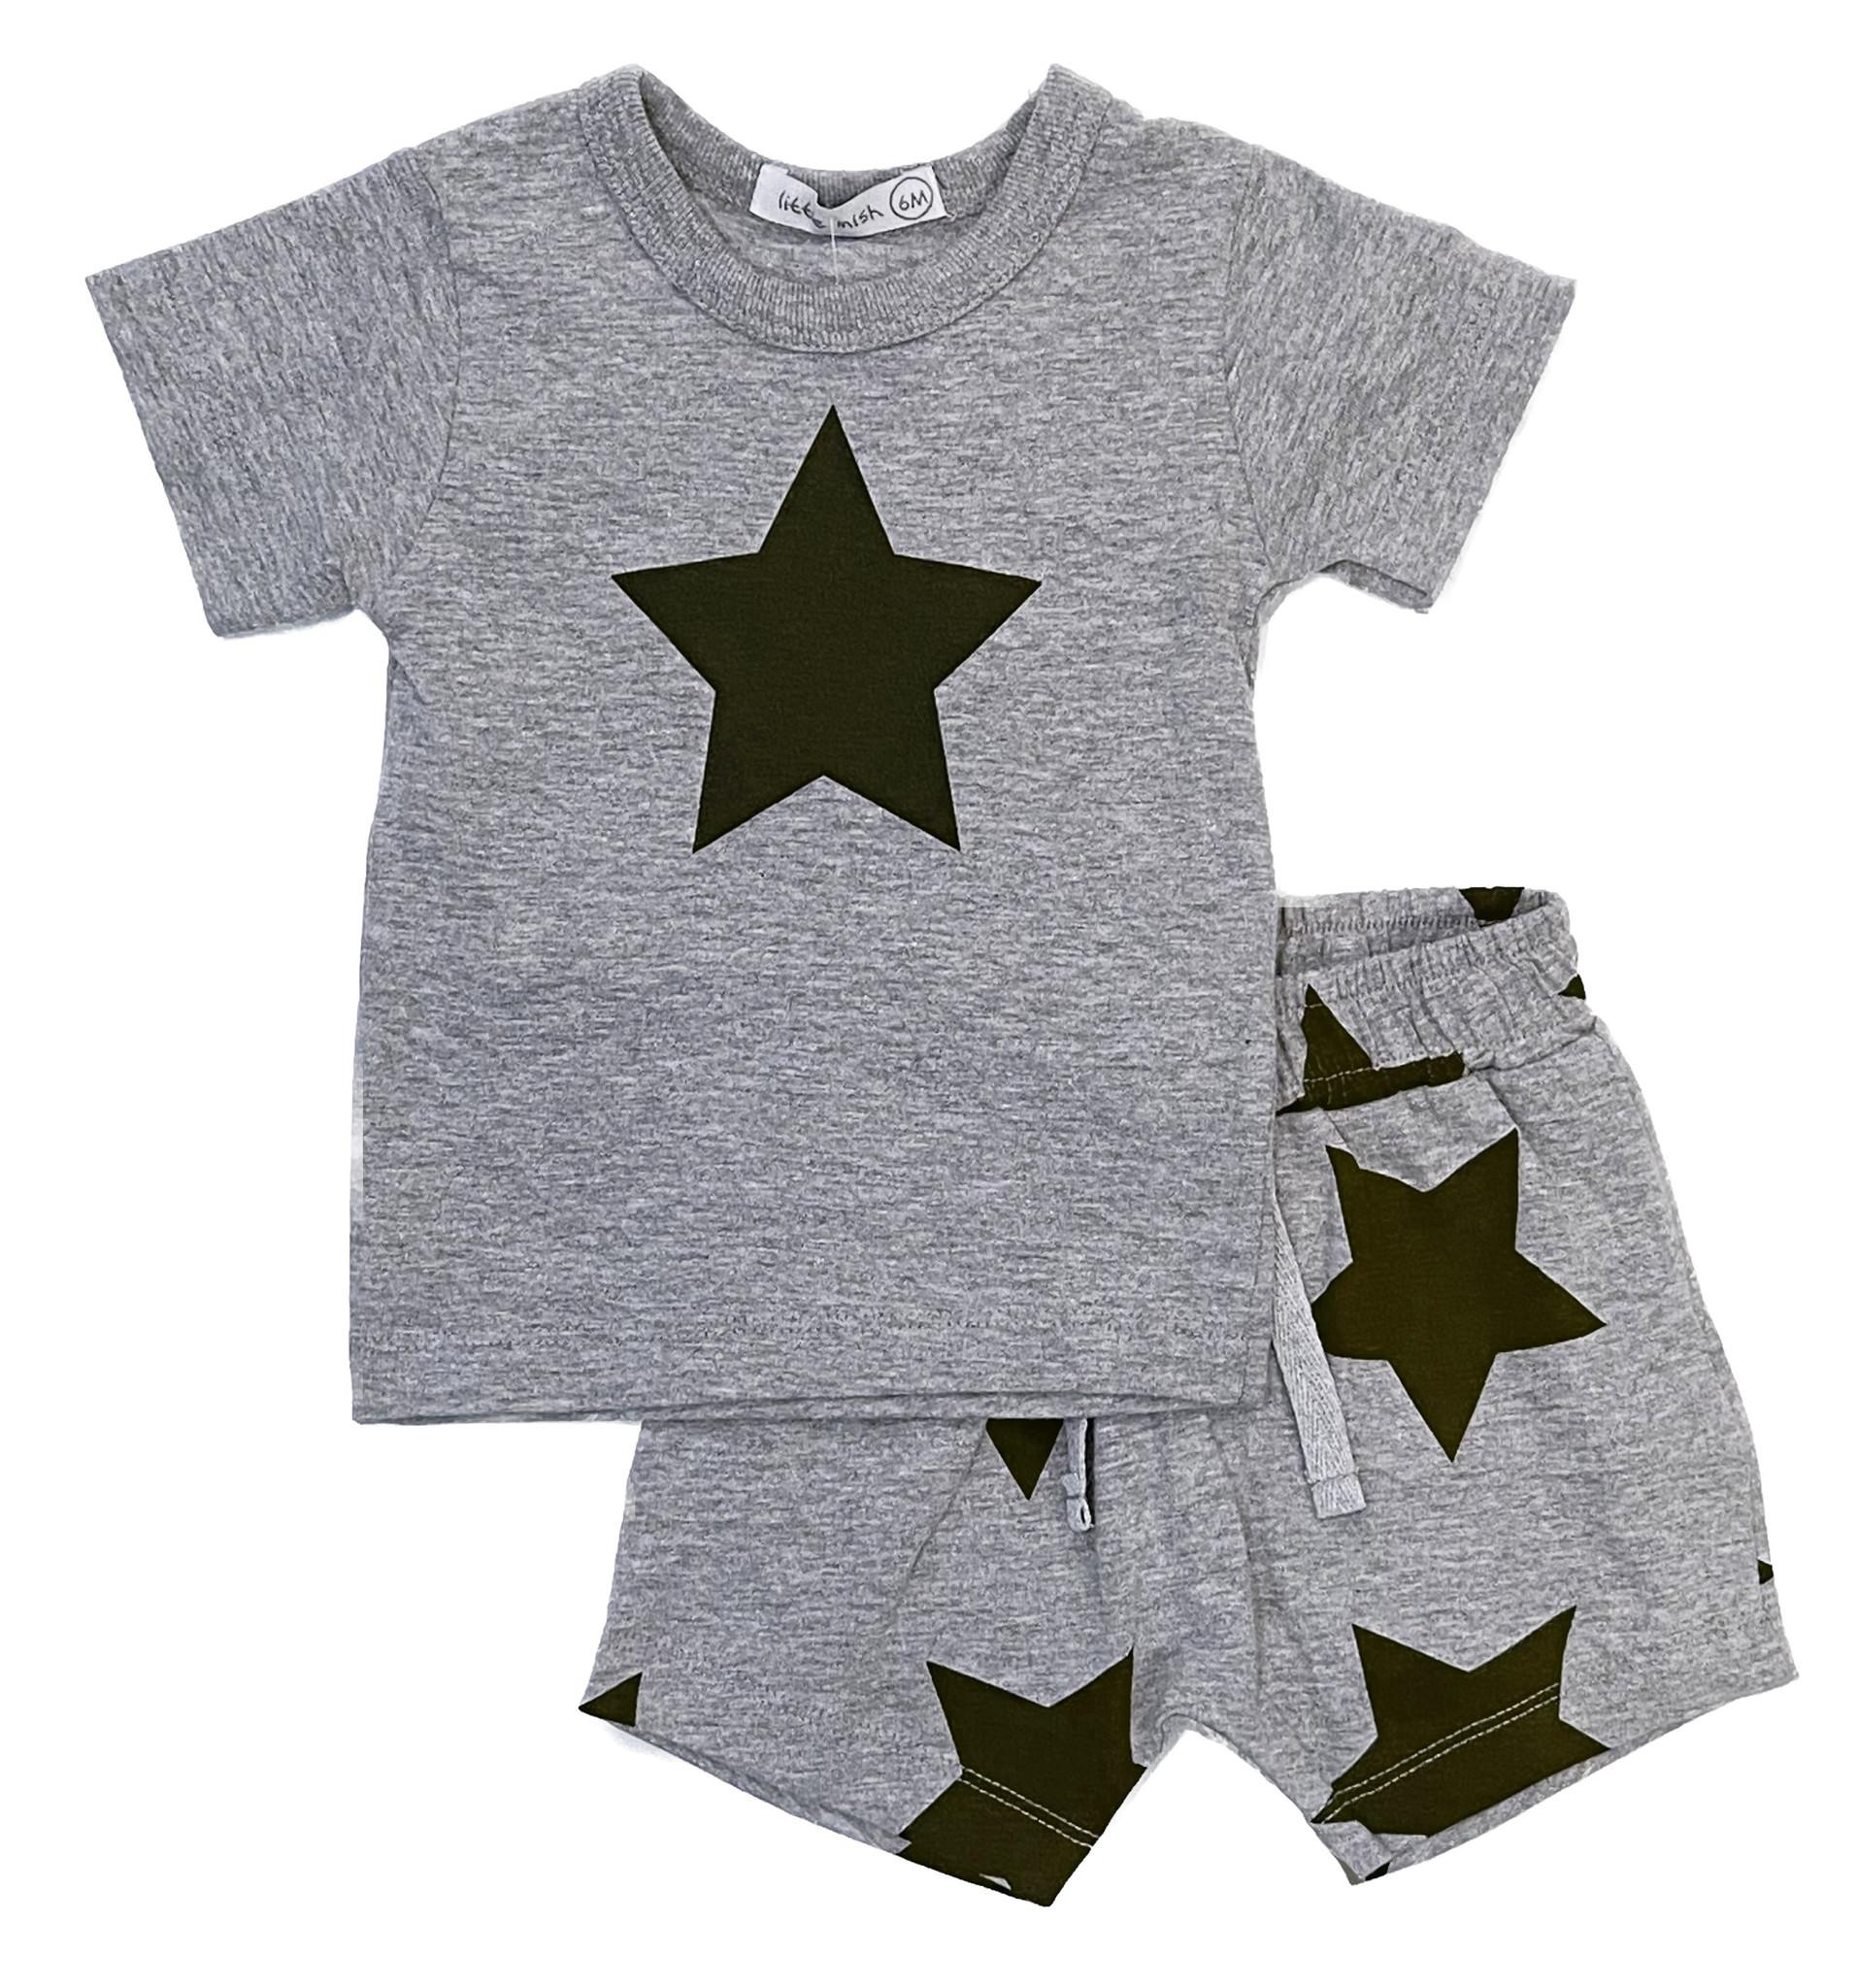 Little Mish Grey/Navy Lg Star Short Set